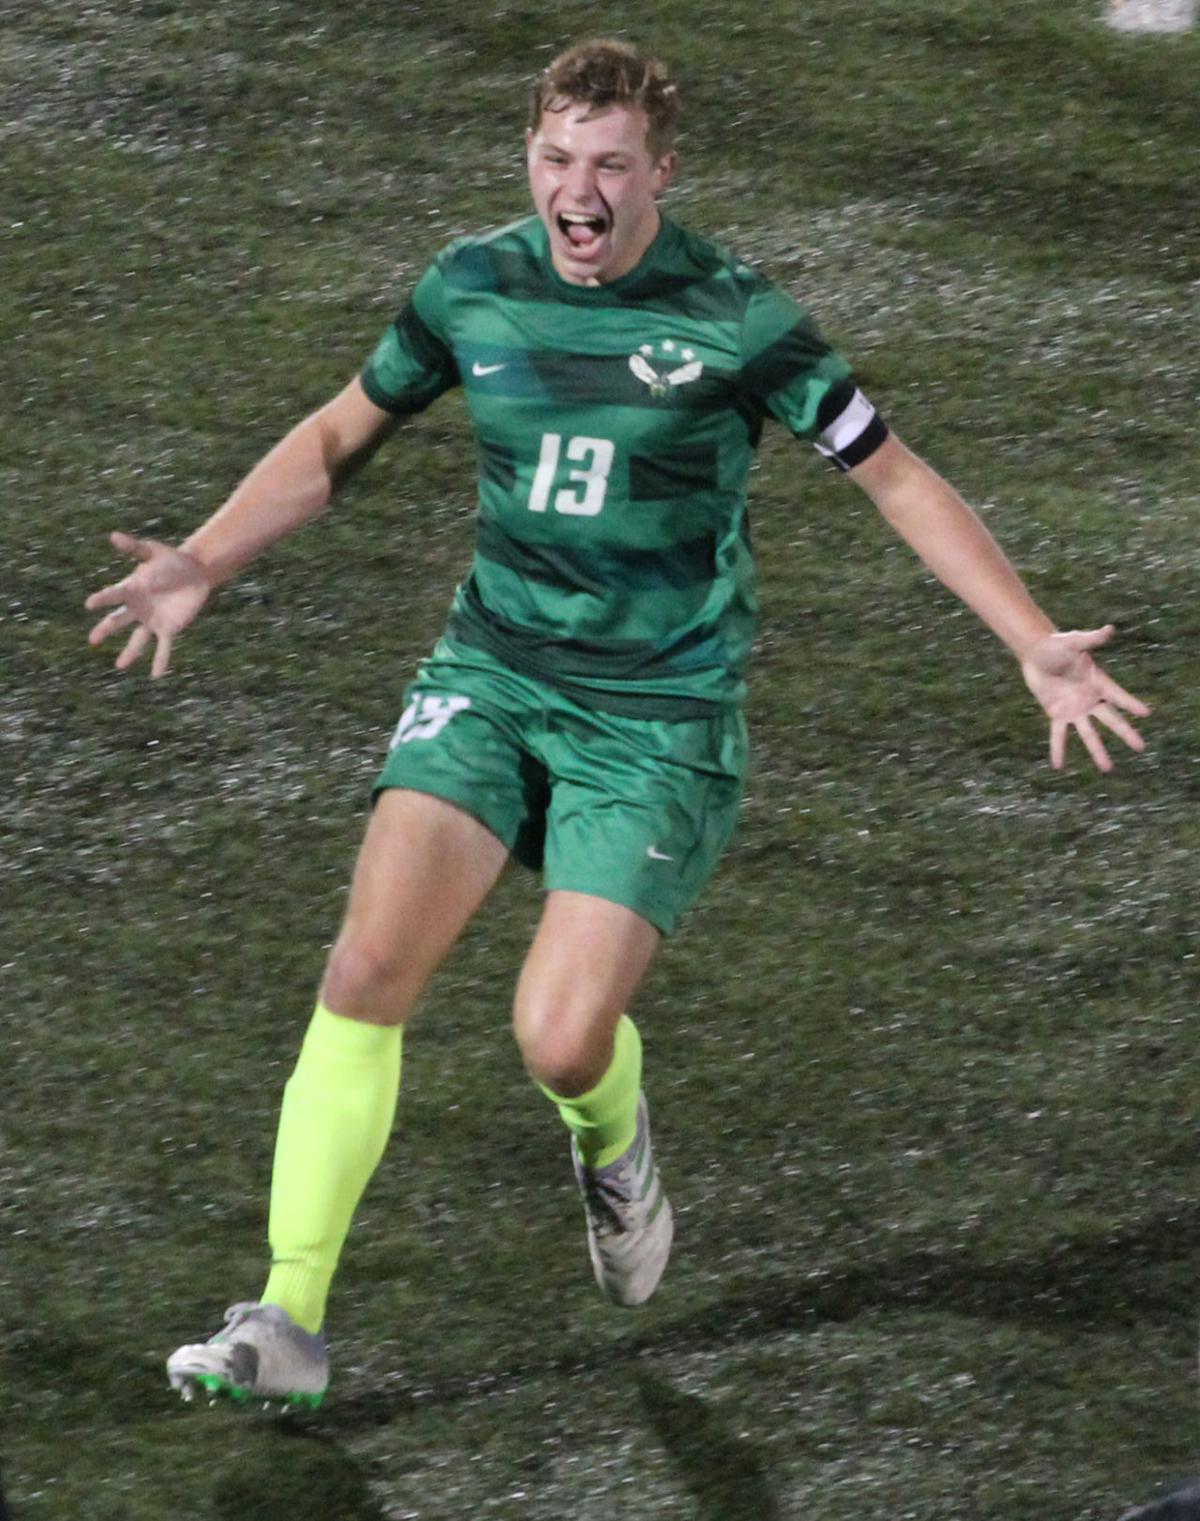 Edina Soccer - Swanda